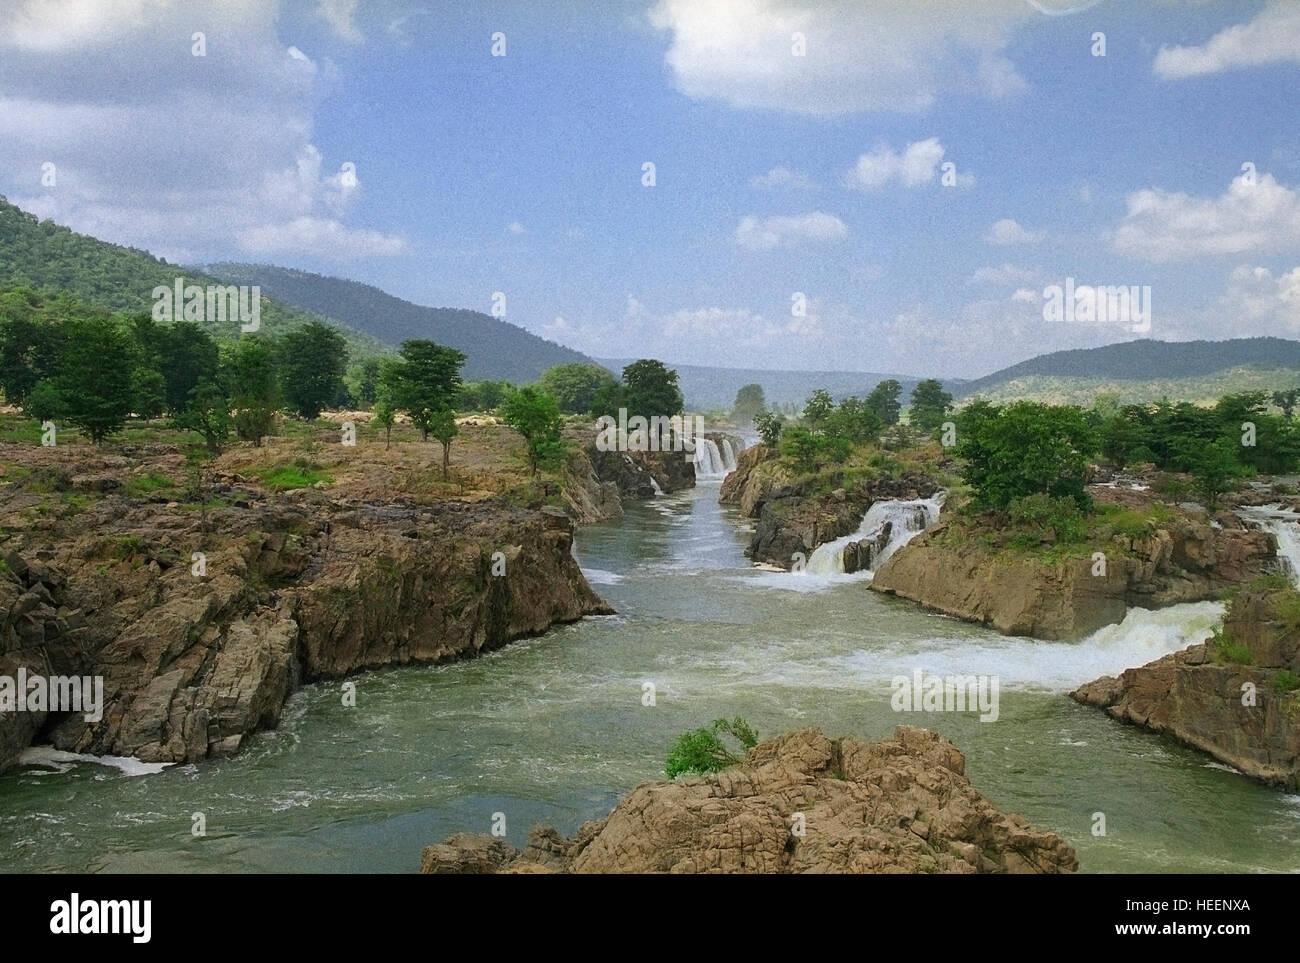 Hogenakkal Falls, waterfall in South India on the Kaveri river, Dharmapuri district, Tamil Nadu - Stock Image